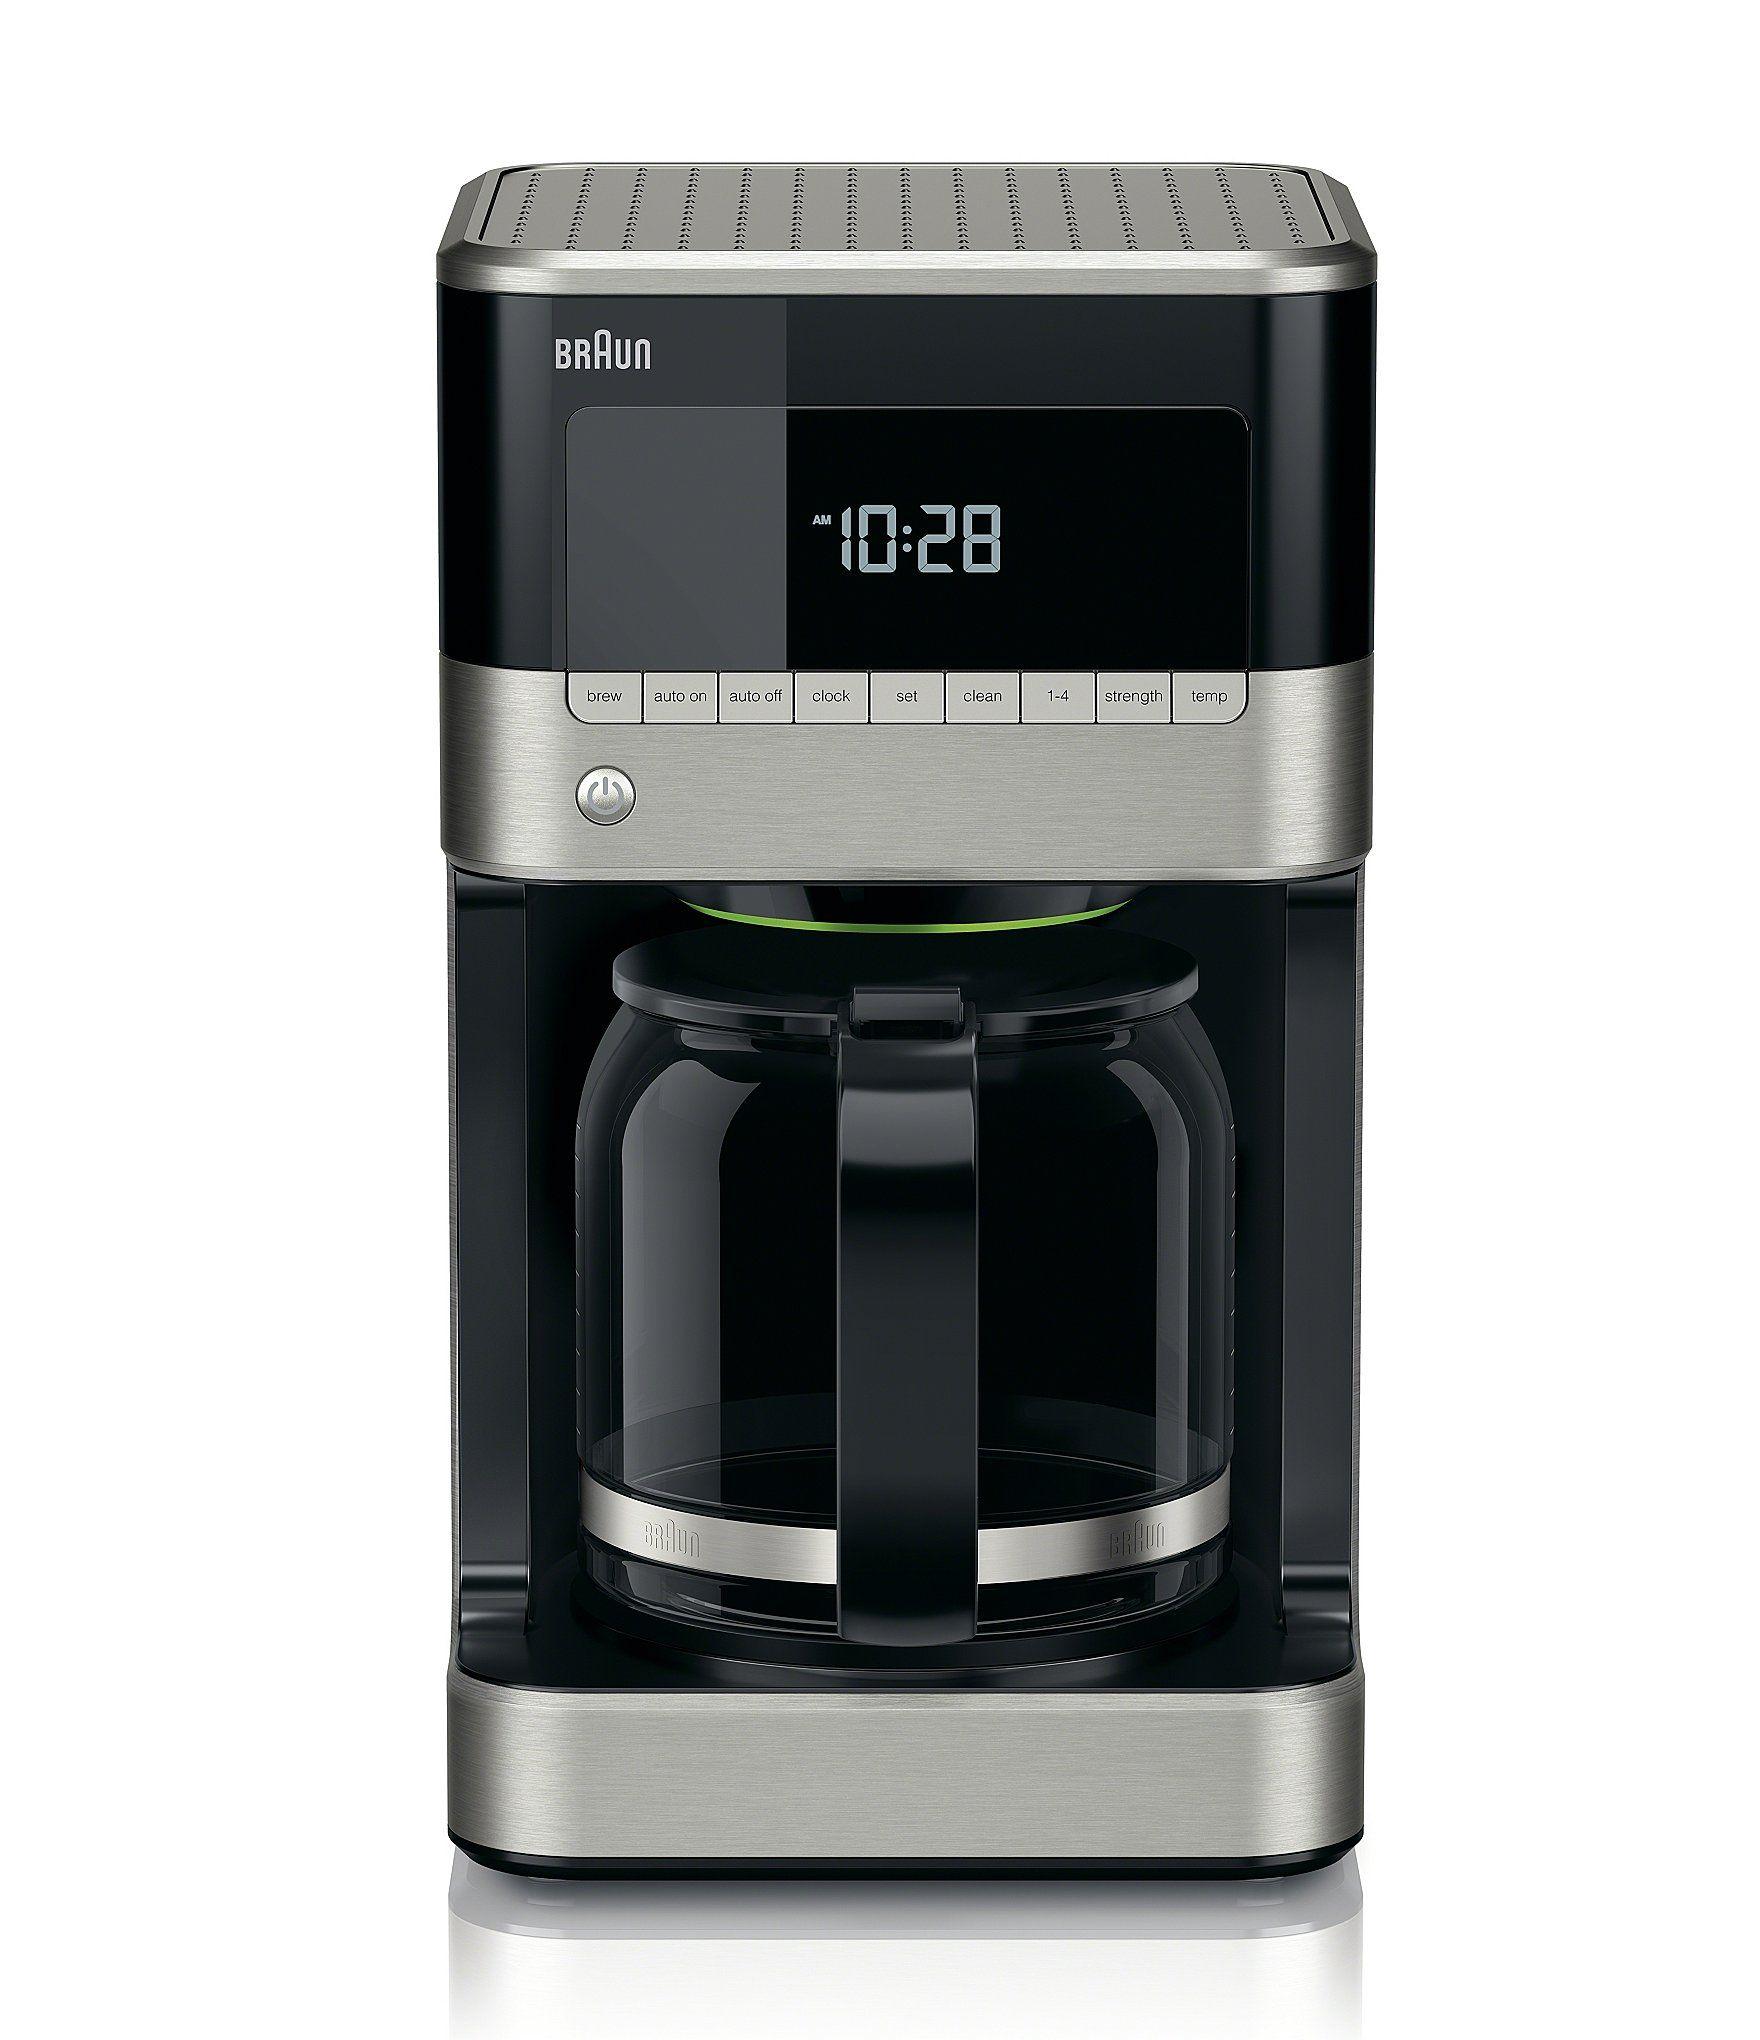 Braun BrewSense 12Cup Drip Coffeemaker Black/Stainless